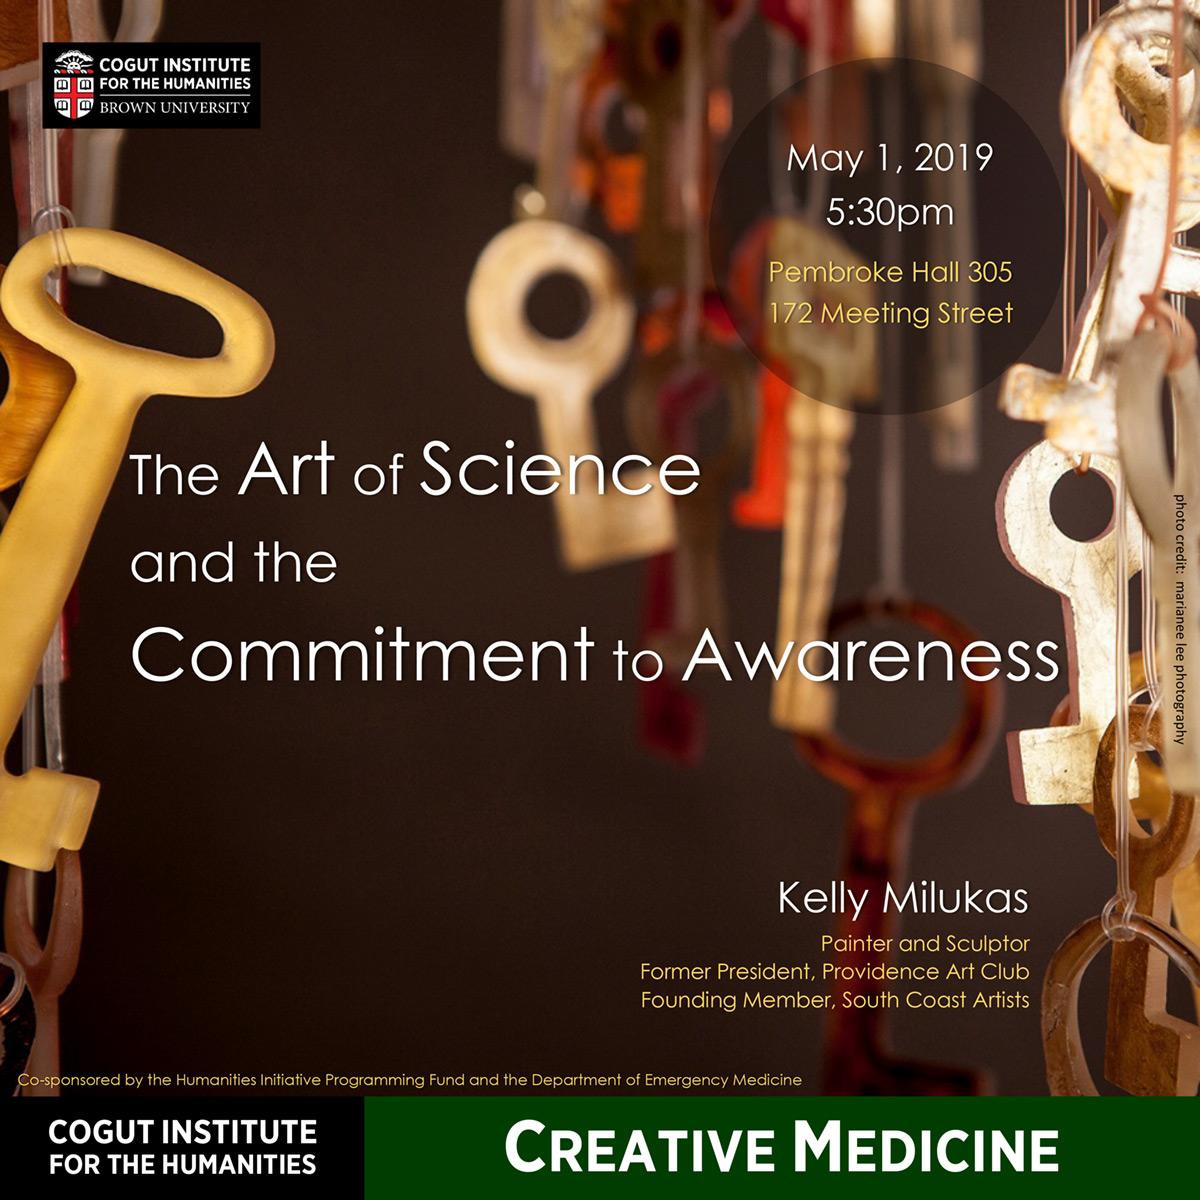 Creative Medicine Lecture Series